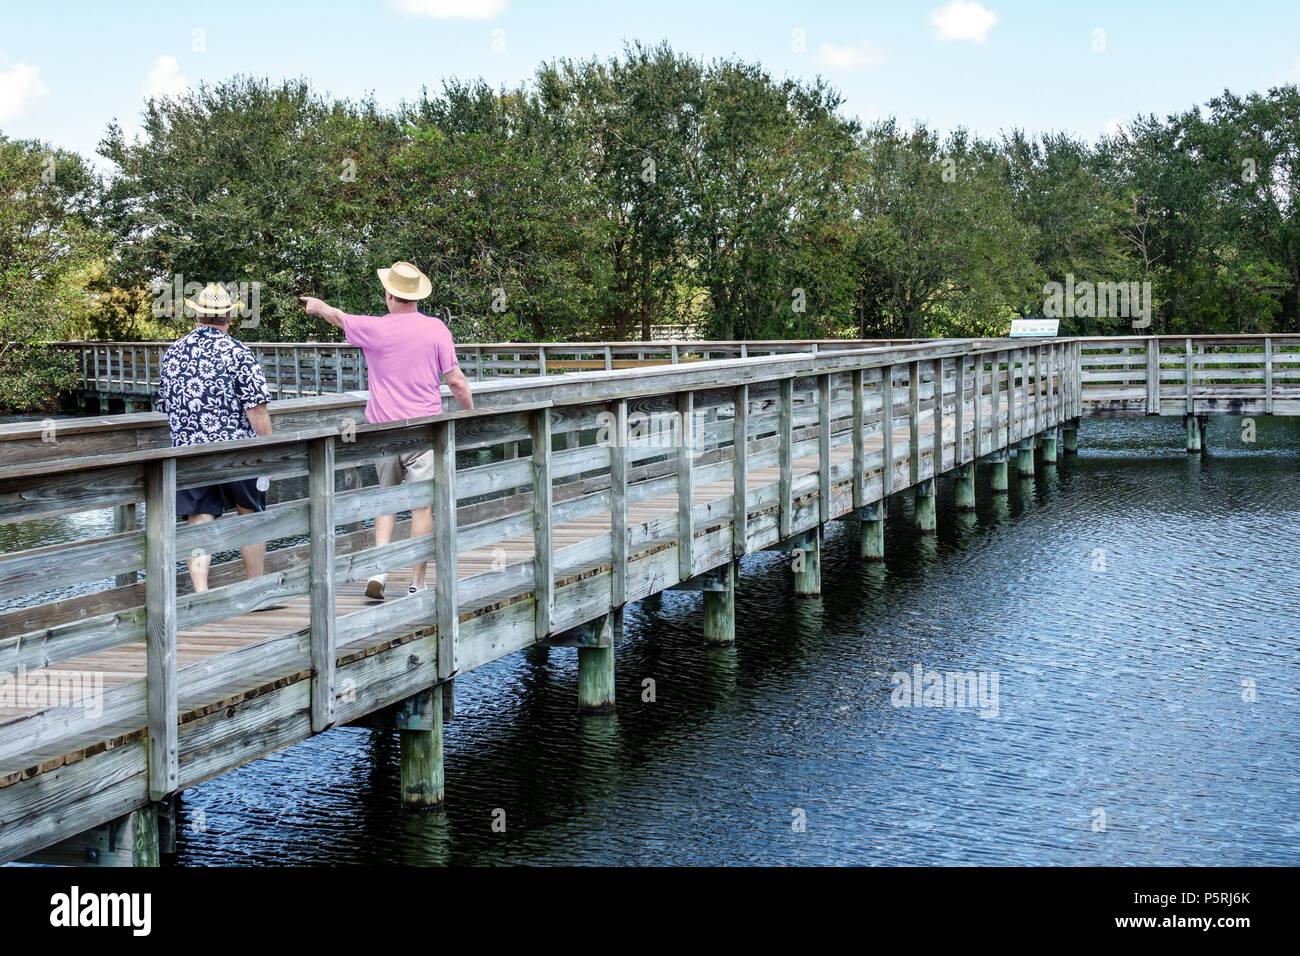 Delray Beach Florida Wakodahatchee Wetlands nature wildlife preserve park boardwalk trail protected bird habitat water reclamation project man hiker w - Stock Image